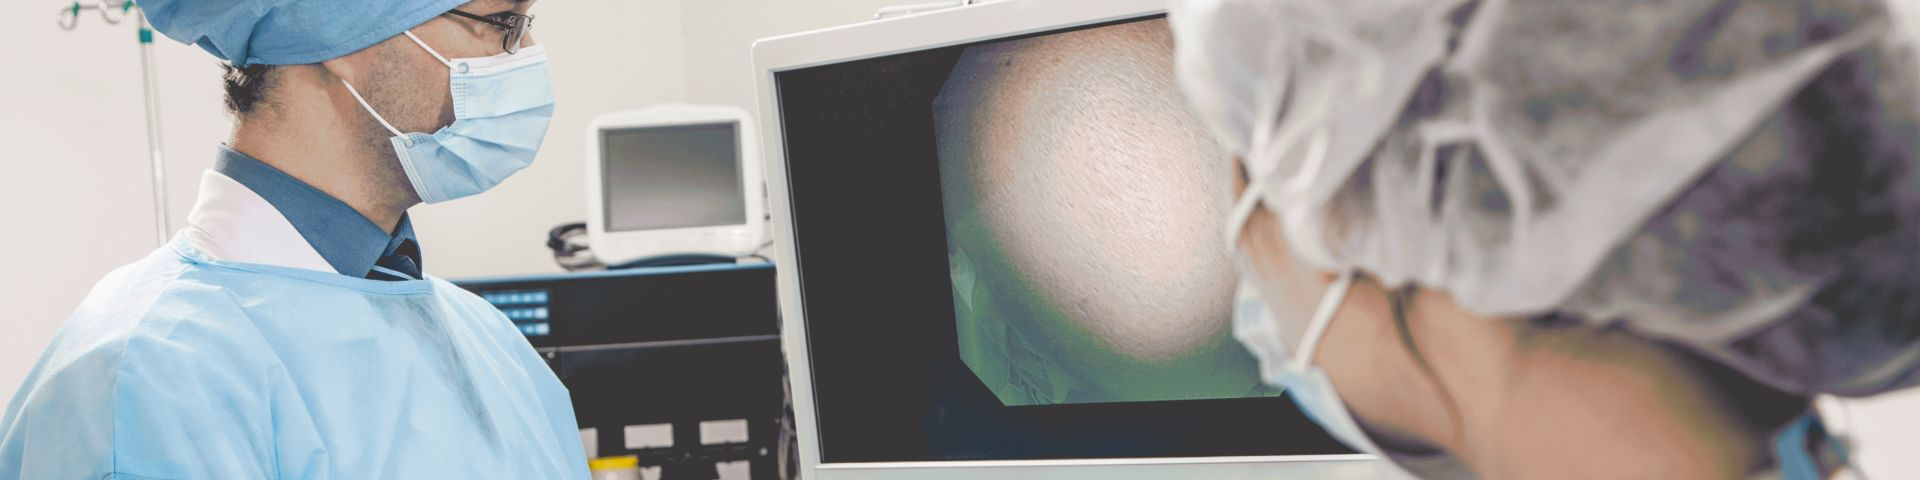 Endoscopic Ultrasound